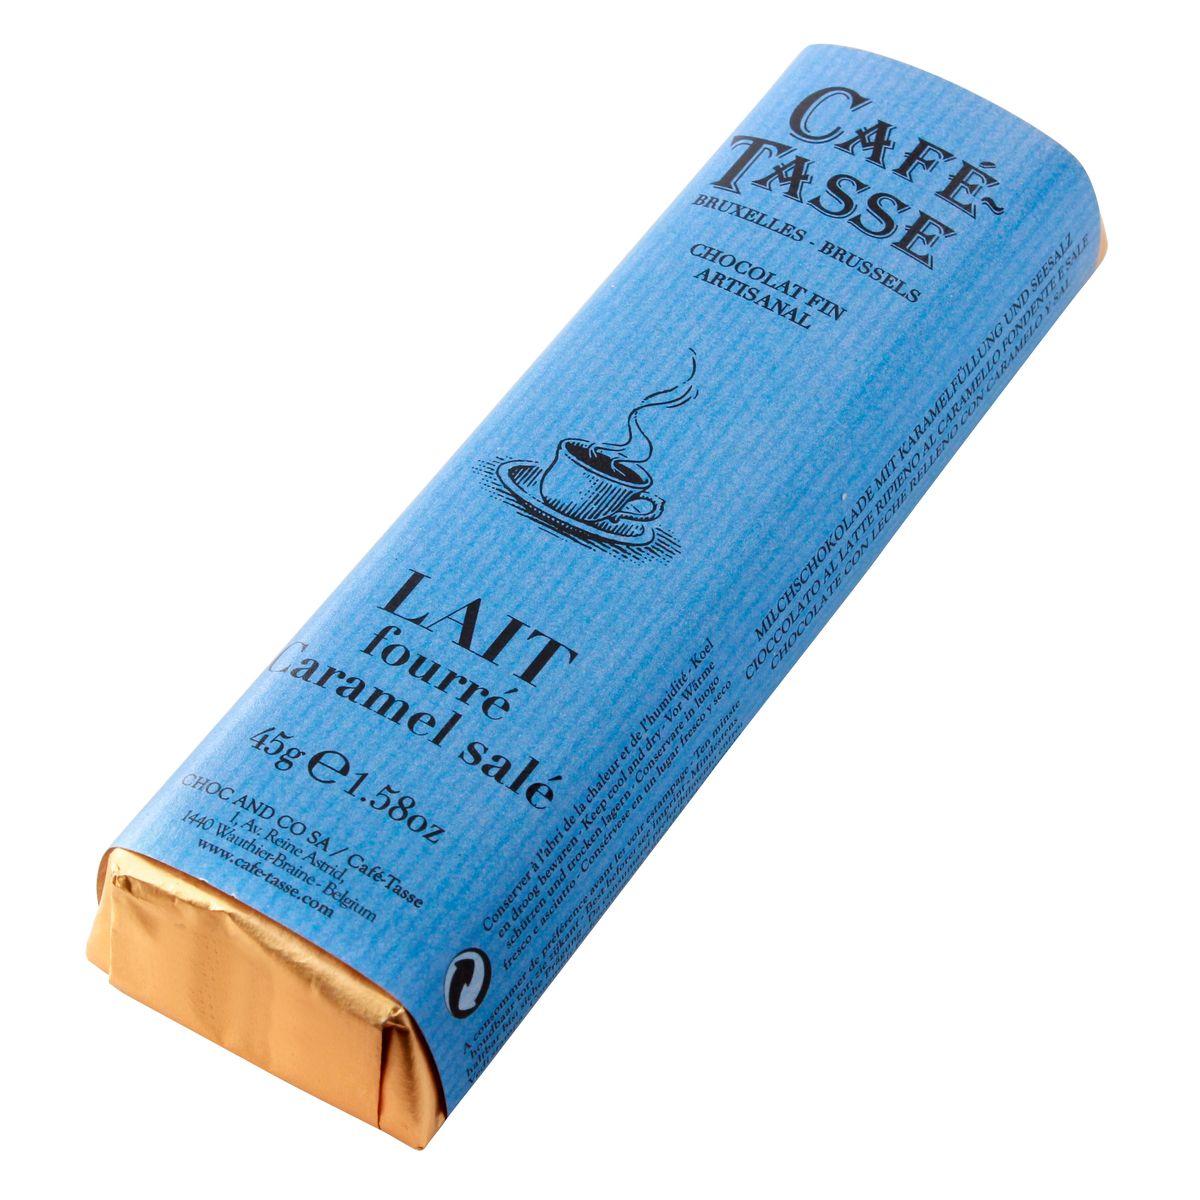 Bâton assorti goût lait caramel salé 45gr - Cafetasse